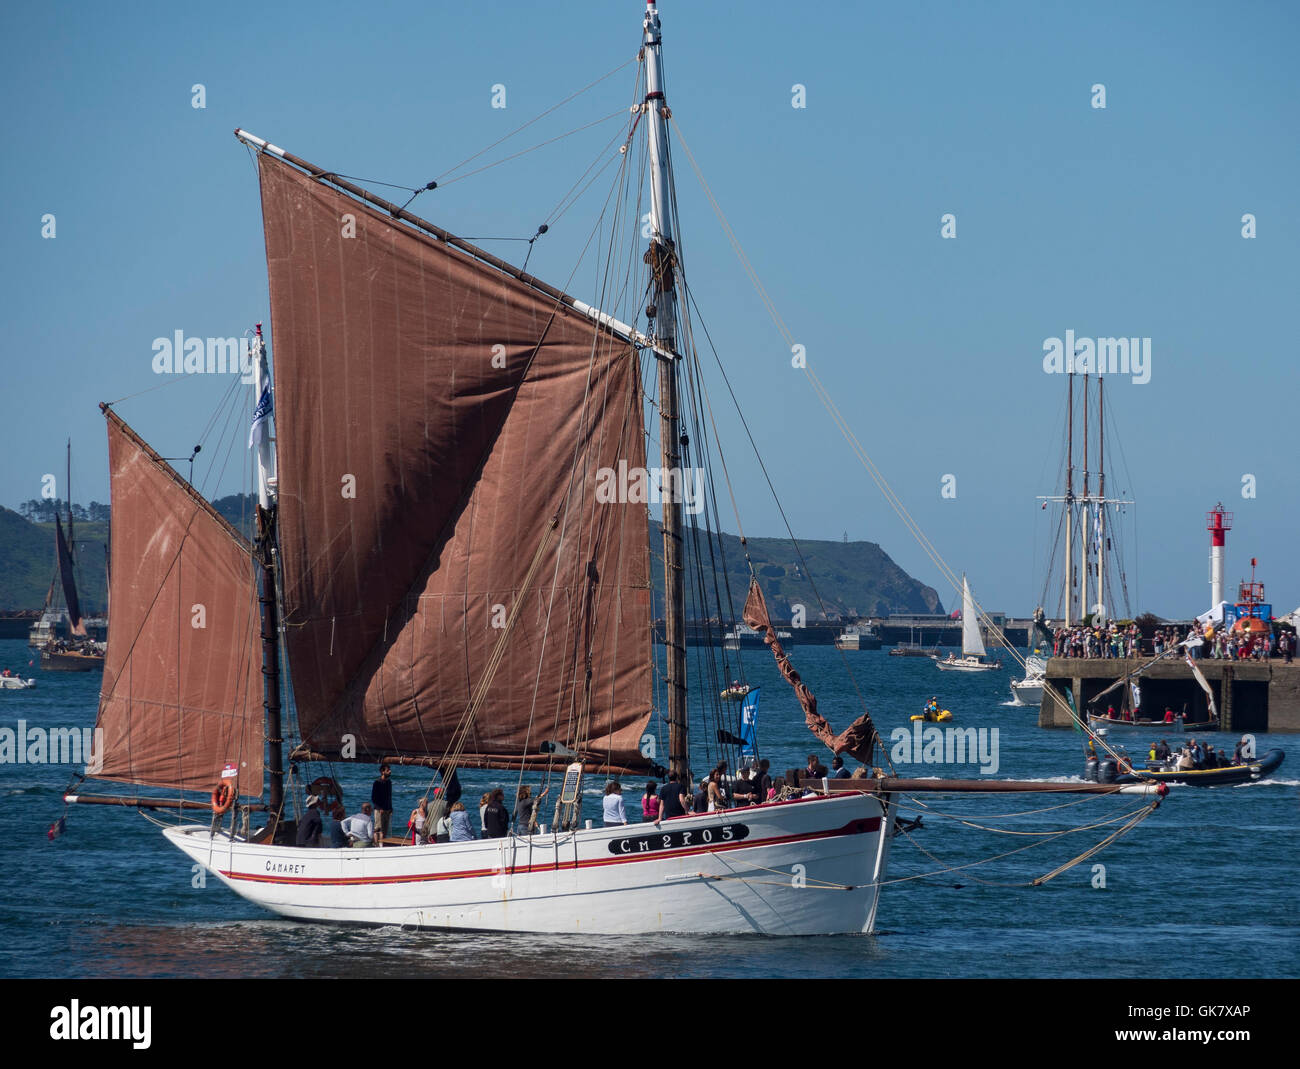 BELLE ÉTOILE (CM 2705) , full  sails, sailing in the port of Brest, during the Brest's International Maritime - Stock Image